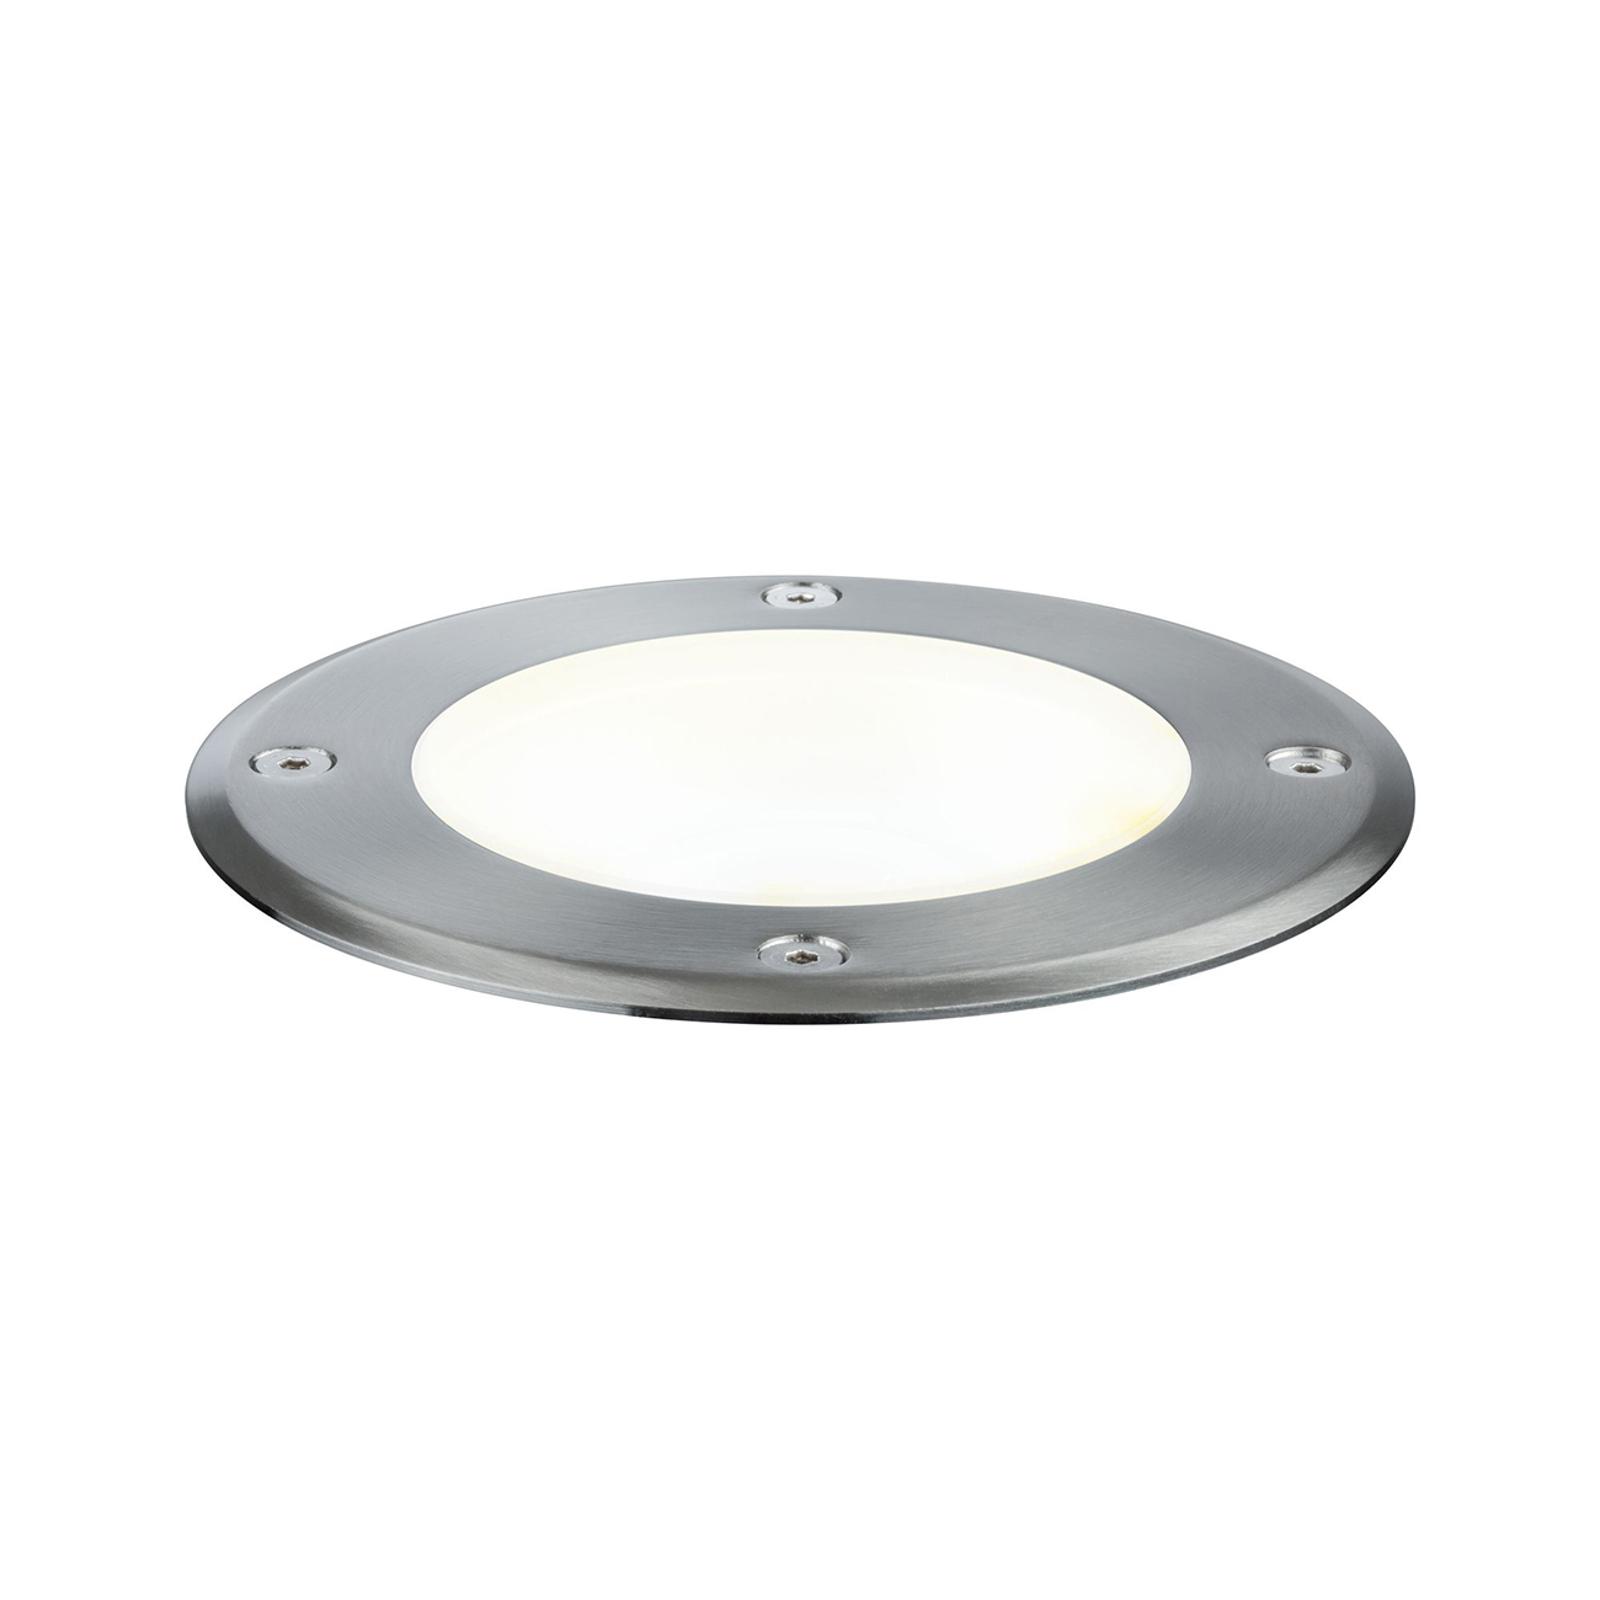 Paulmann Plug & Shine -uppovalo 14cm 3 000 K 20°